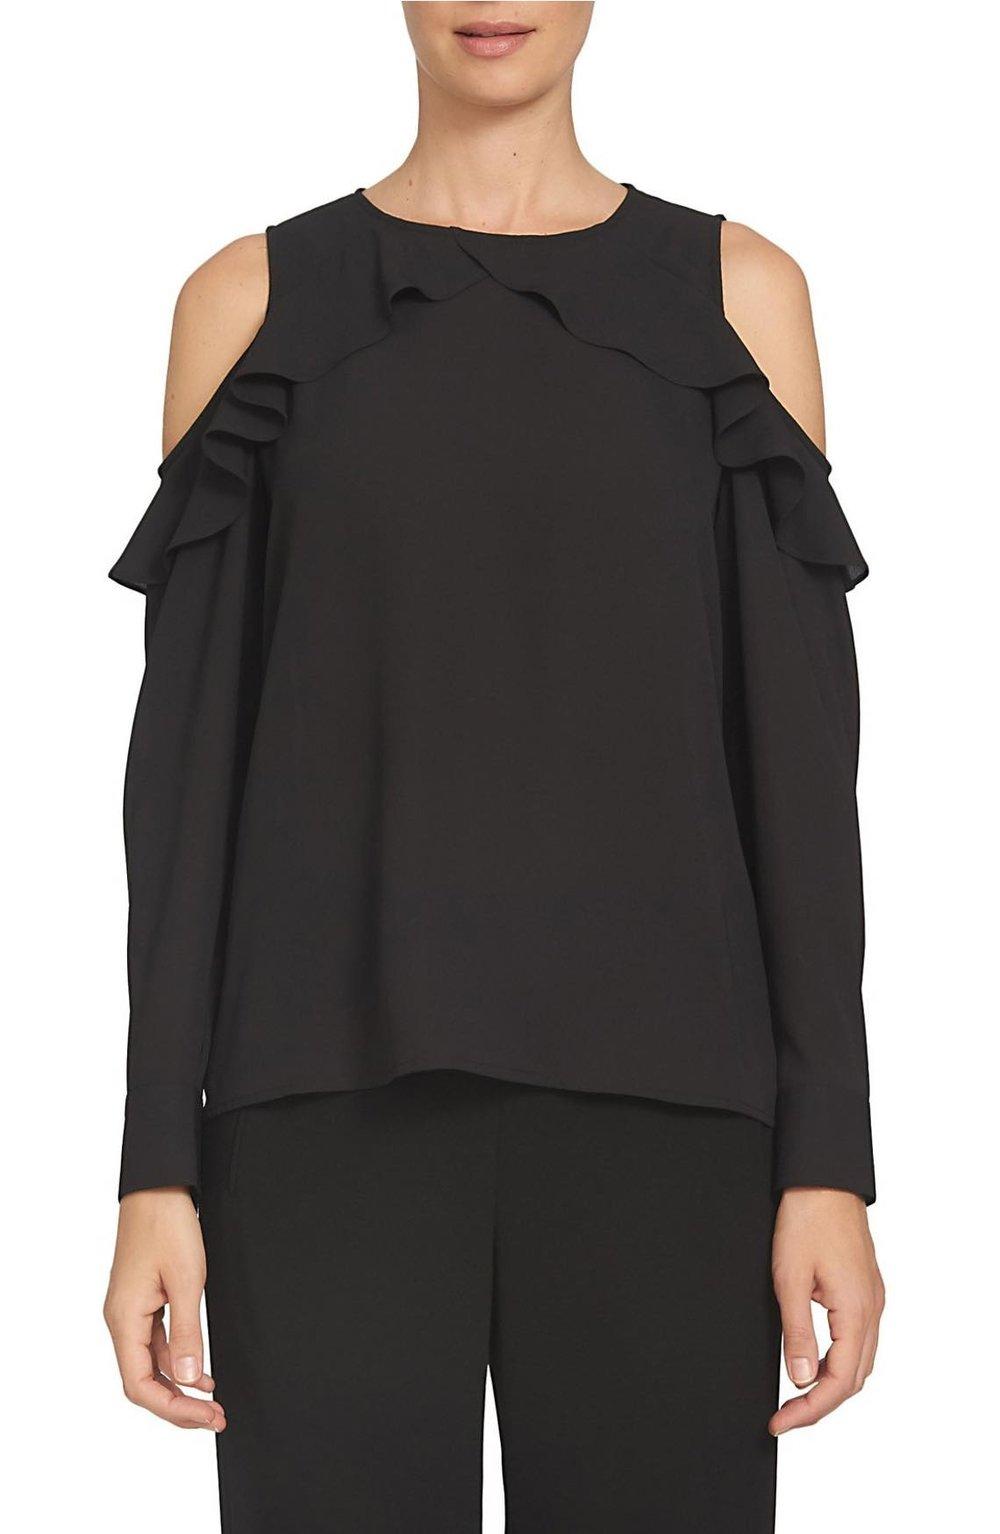 CeCe ruffled cold shoulder blouse in black